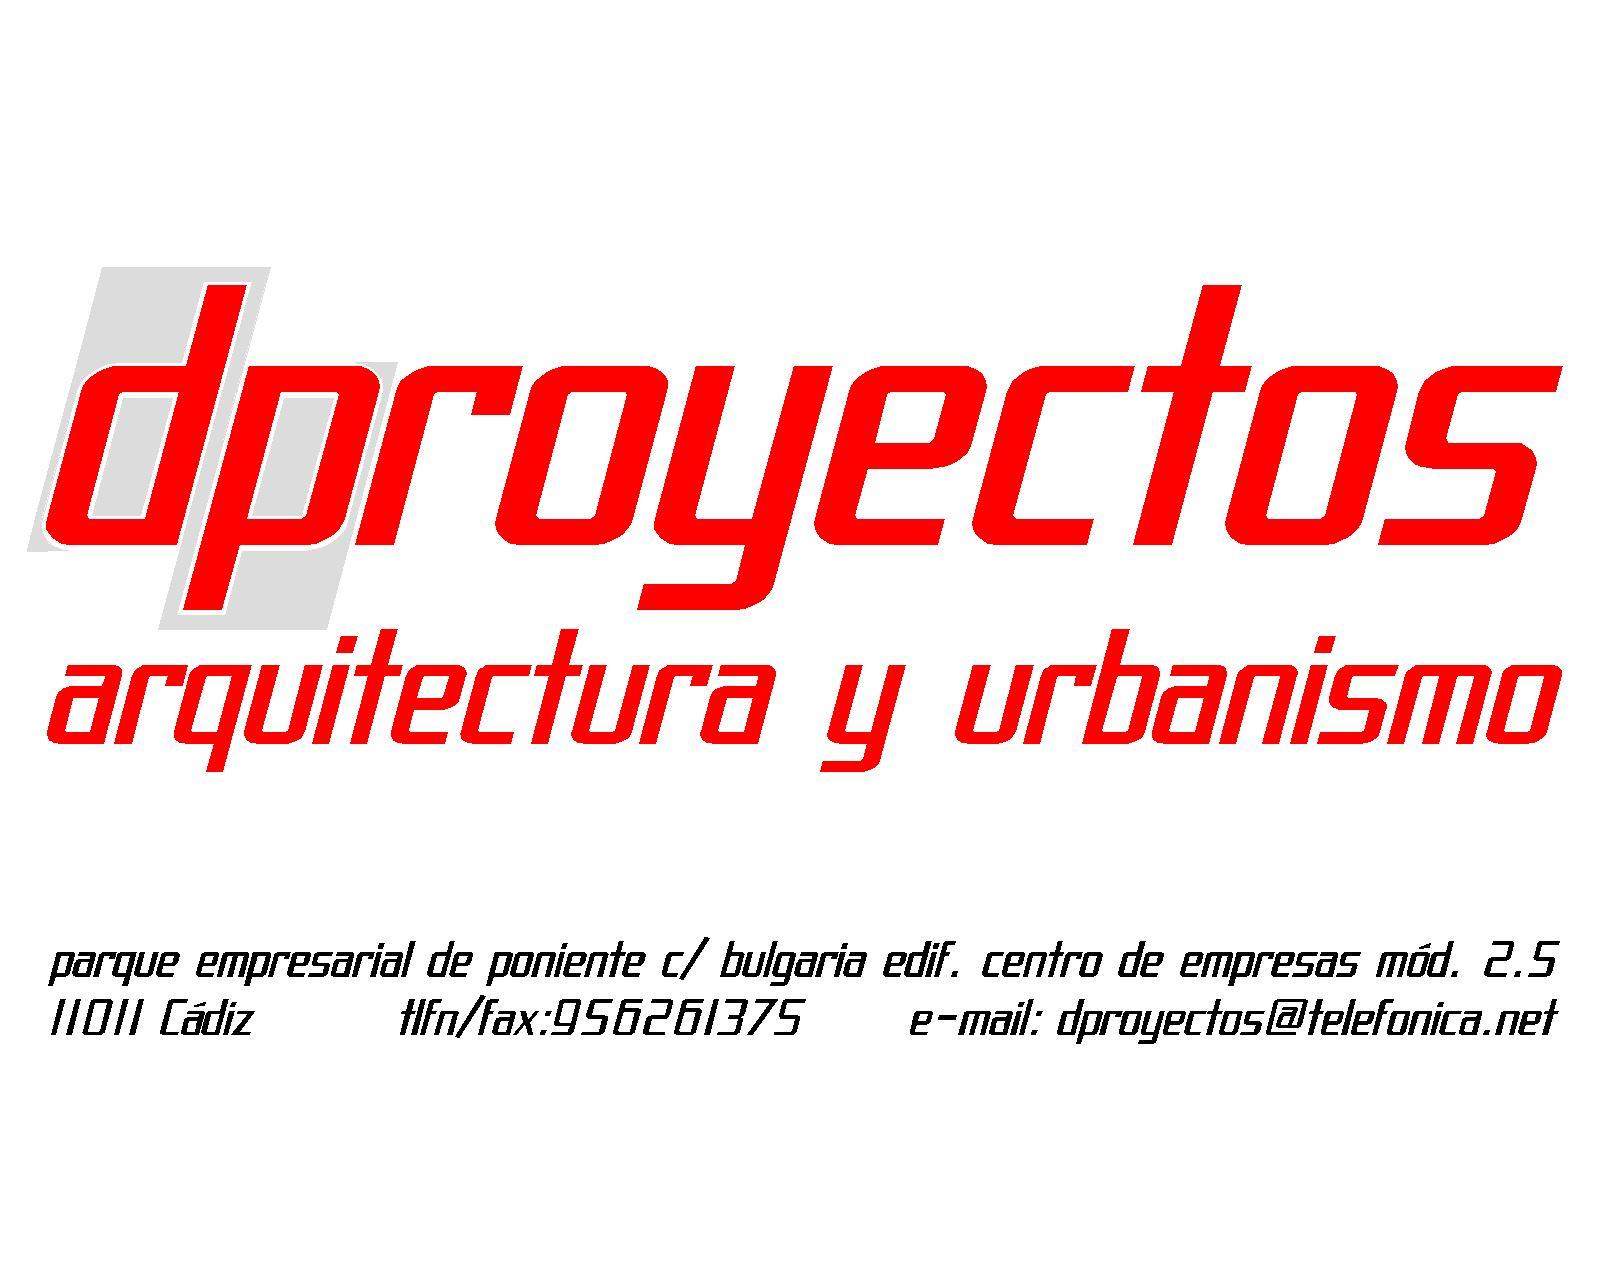 Dproyectos, Arquitectura Y Urbanismo